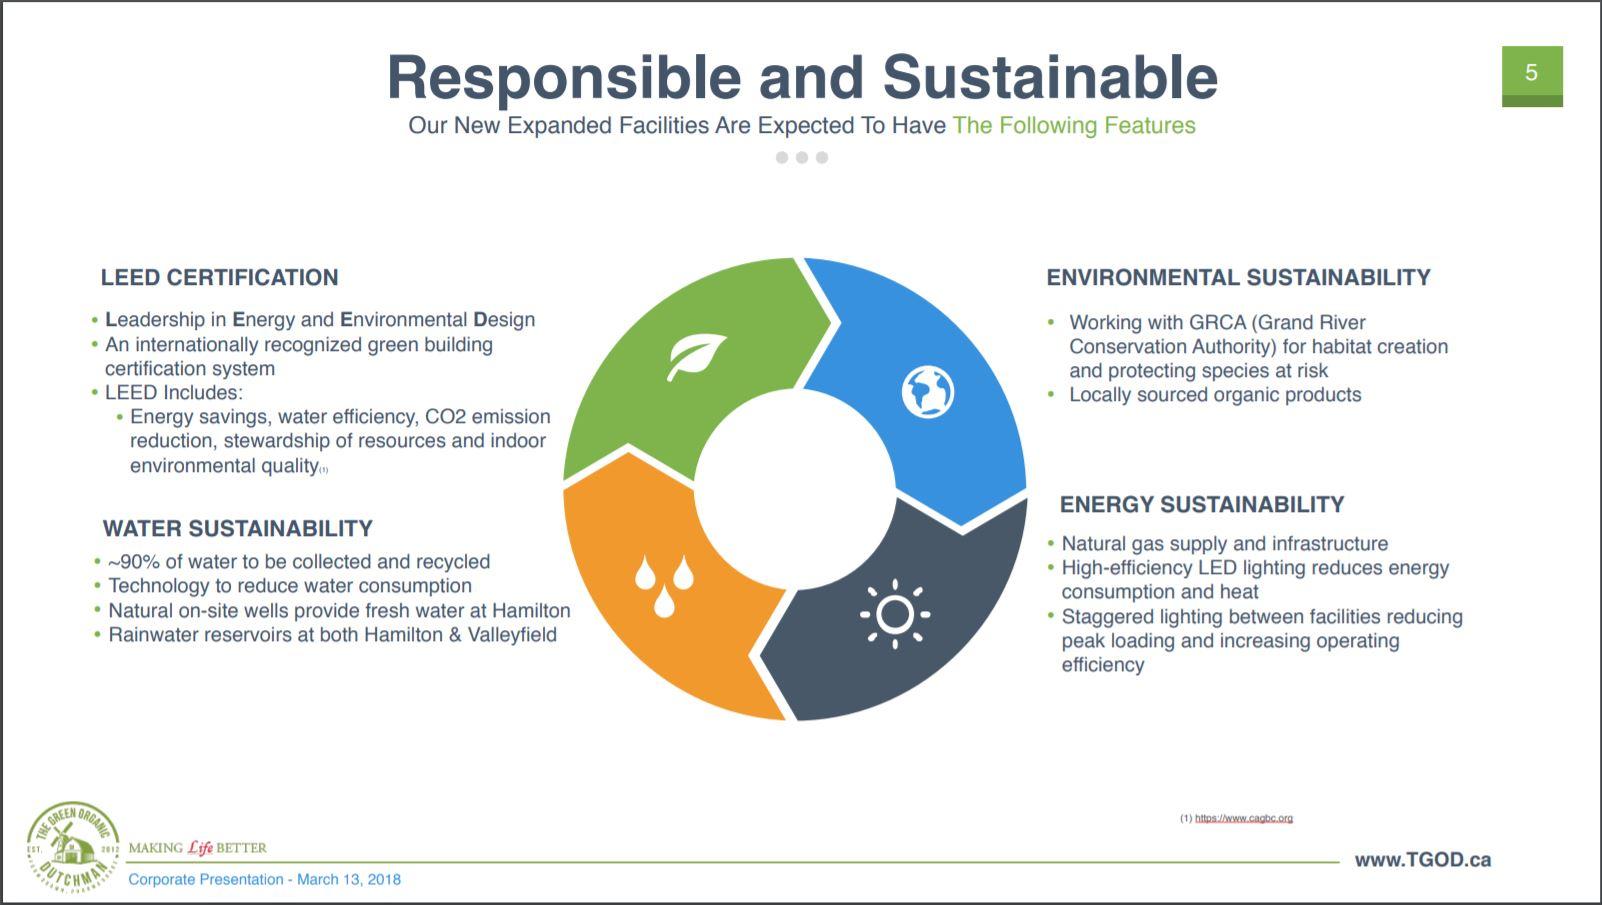 Page 5 of the TGOD investor presentation outlining environmental stewardship.